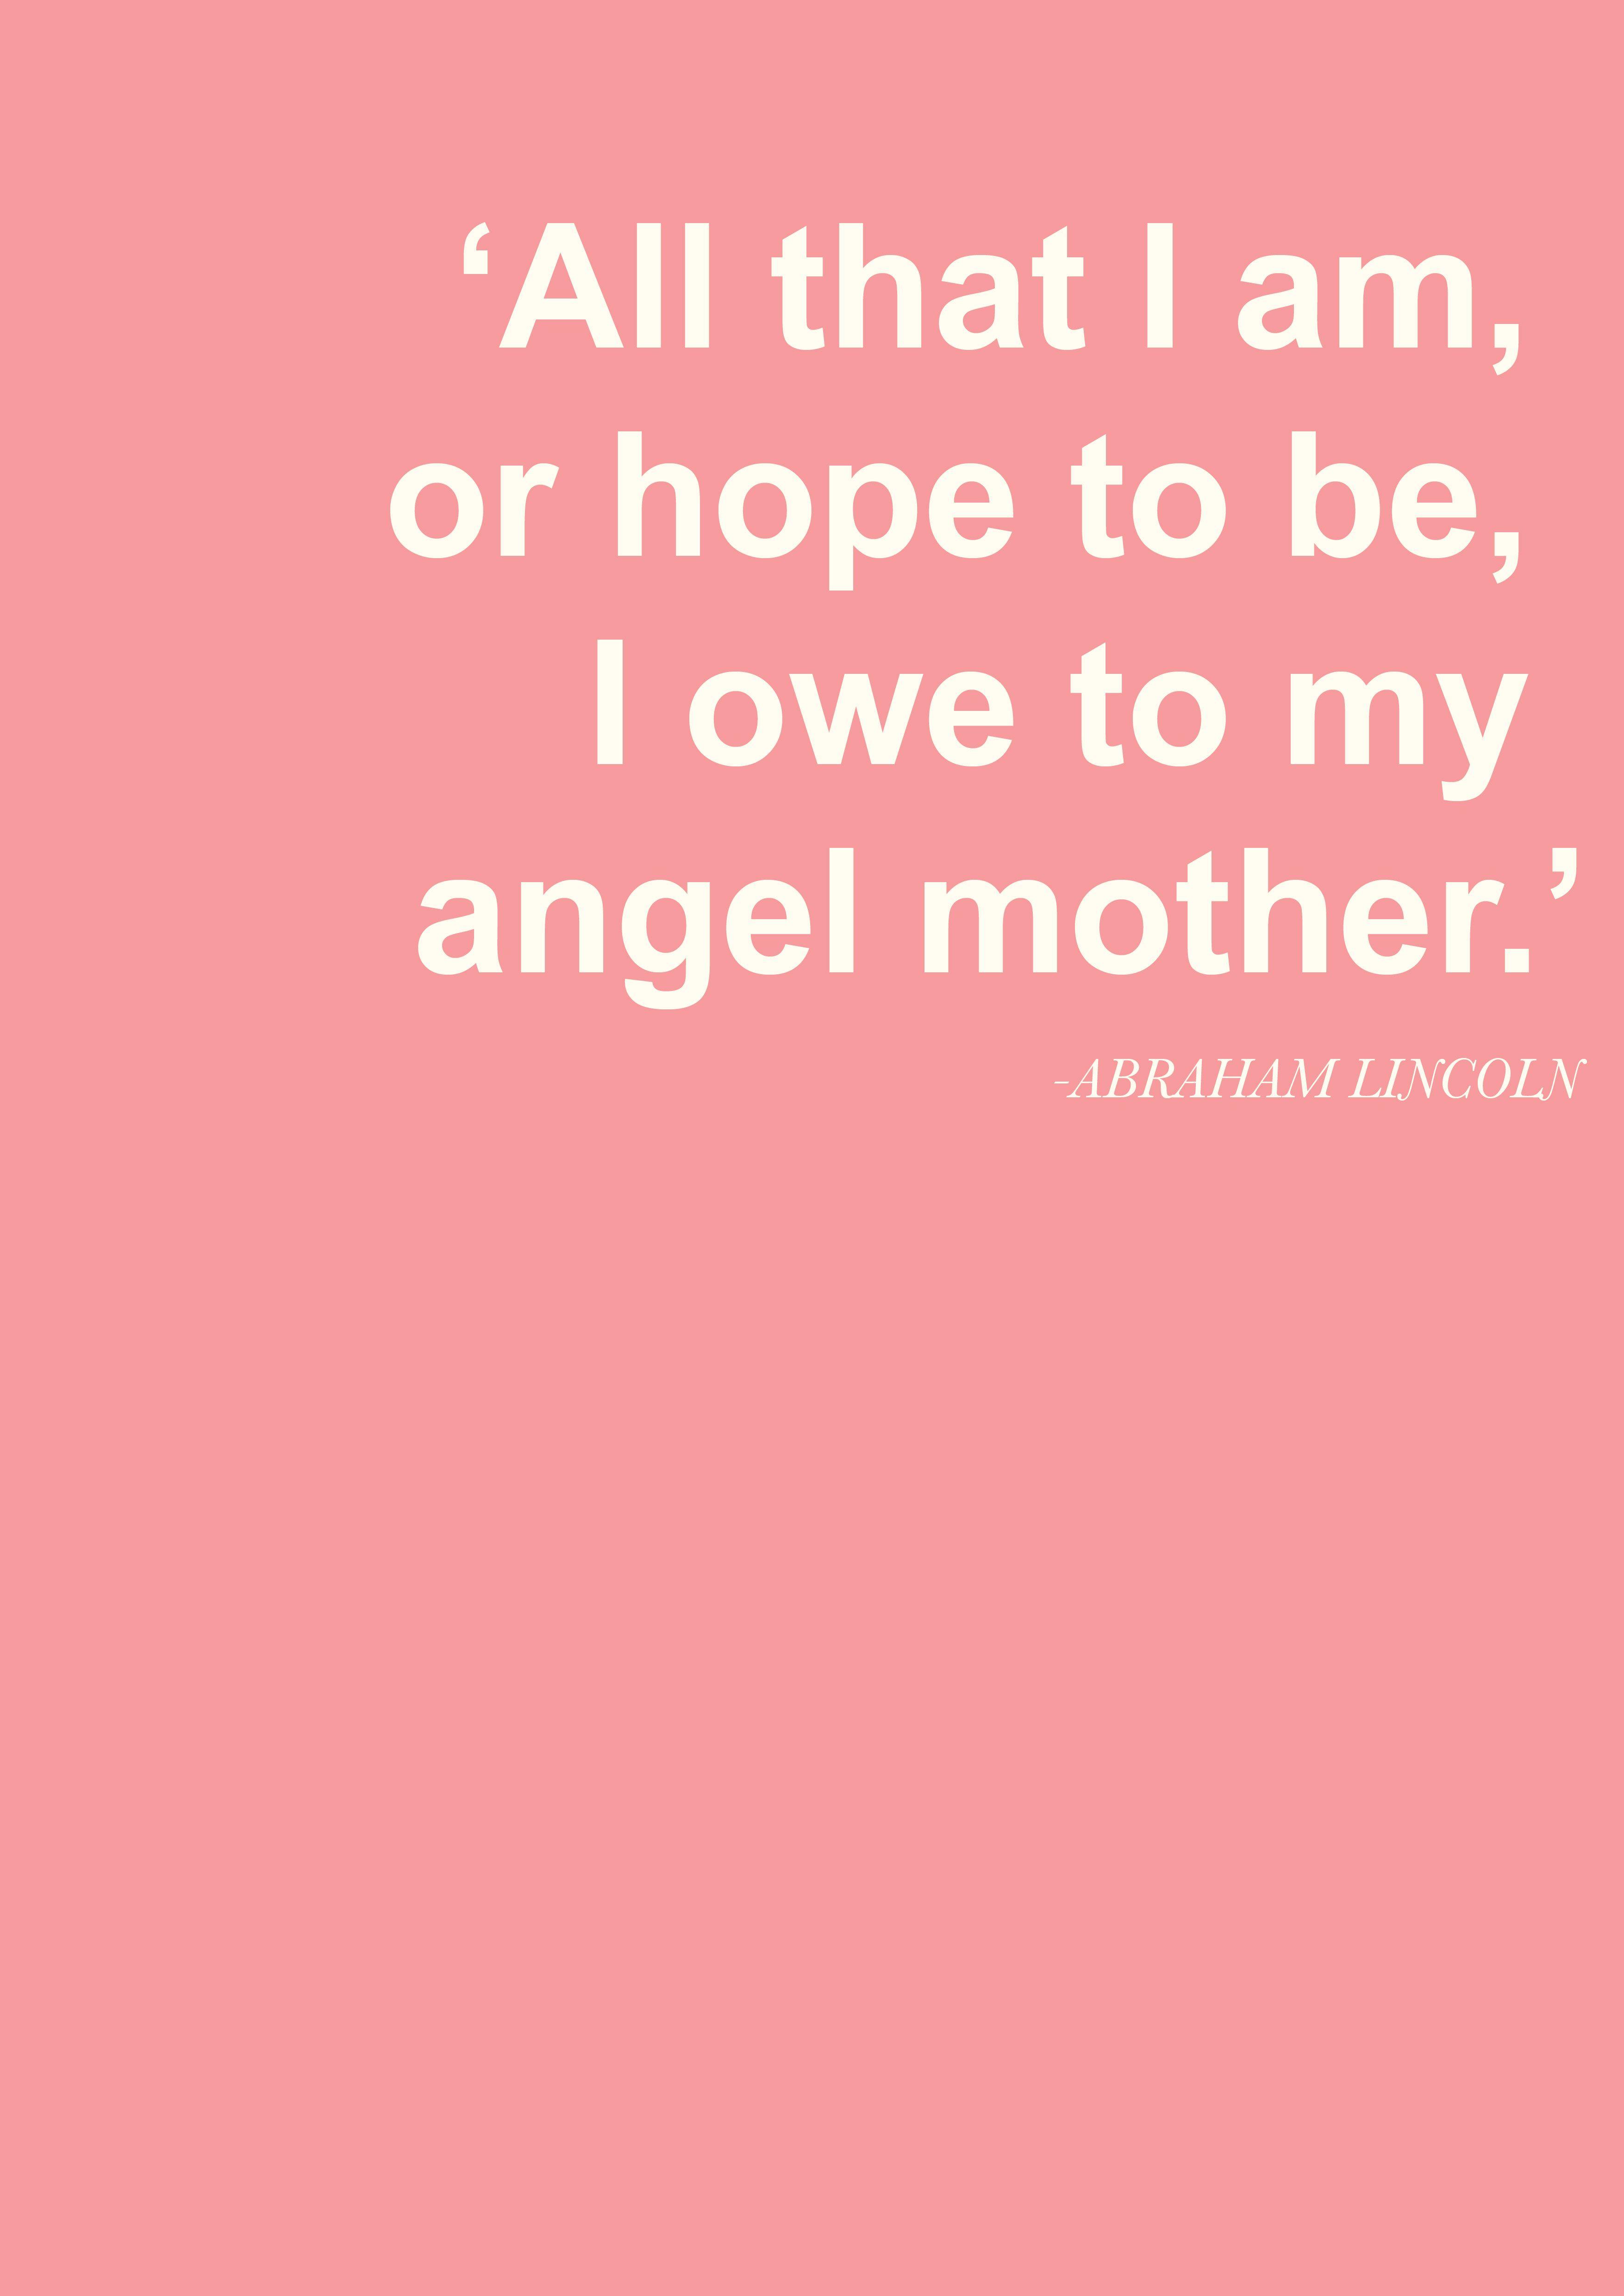 All that I am or hope to be, I owe to my angel mother. - Abraham Lincoln